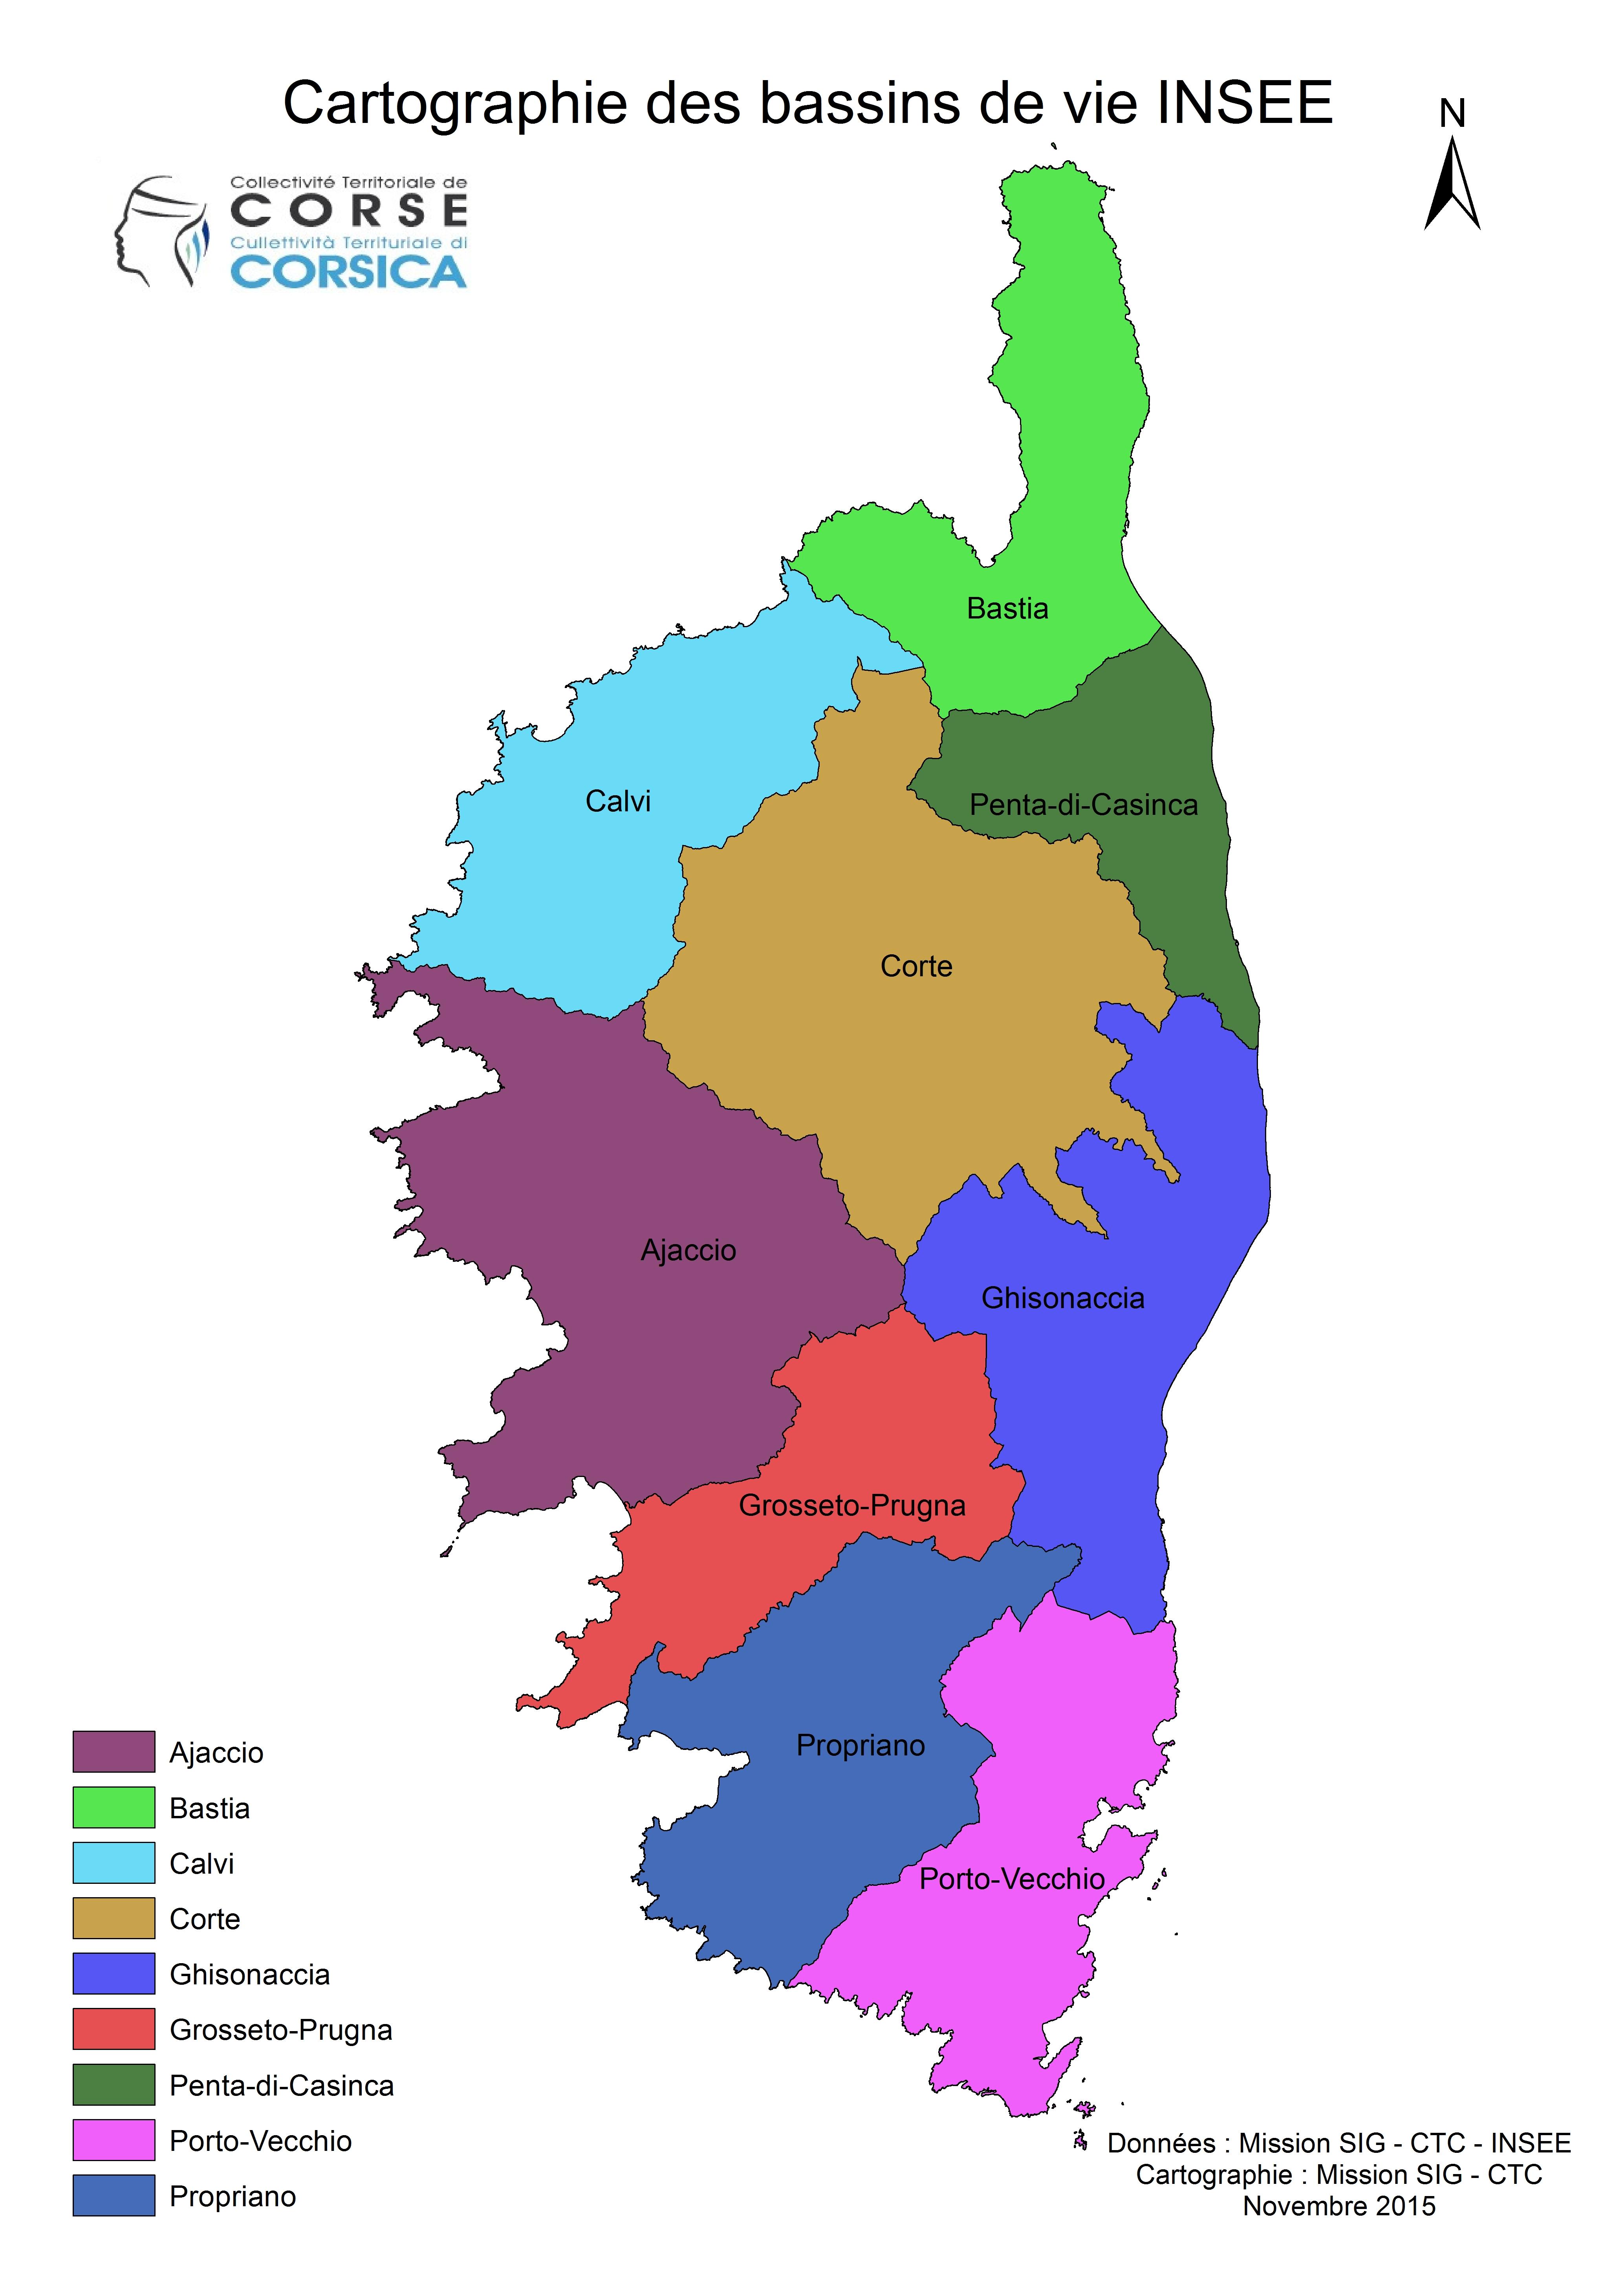 Cartographie des bassins de vie INSEE